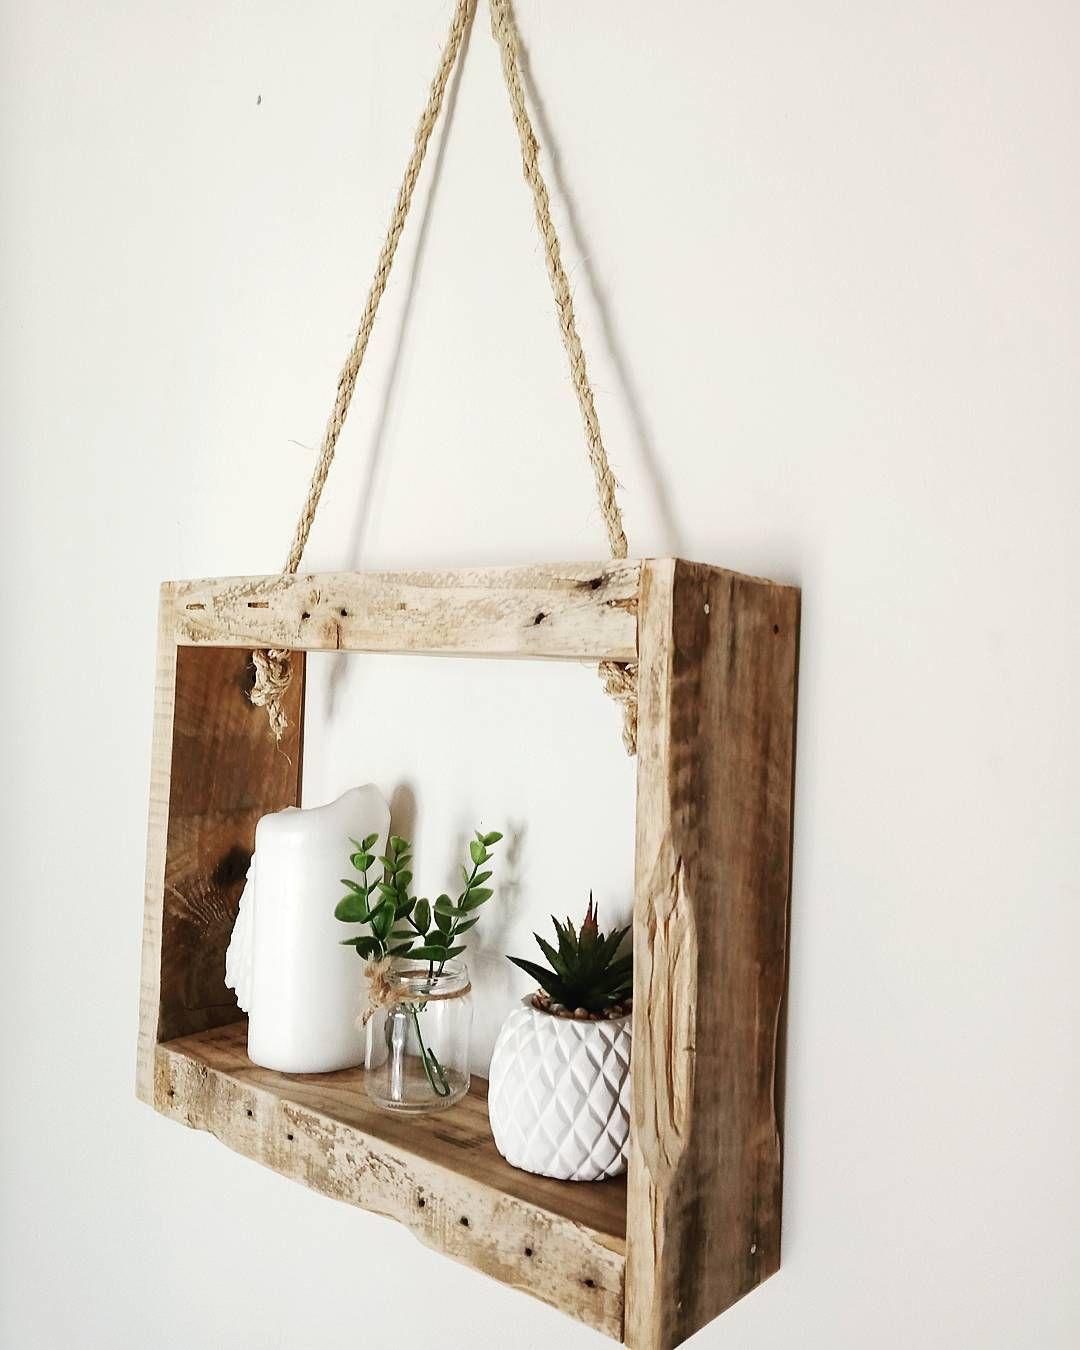 51+ Creative & Cheap Wooden Pallet Projects - 5 Min Ideas